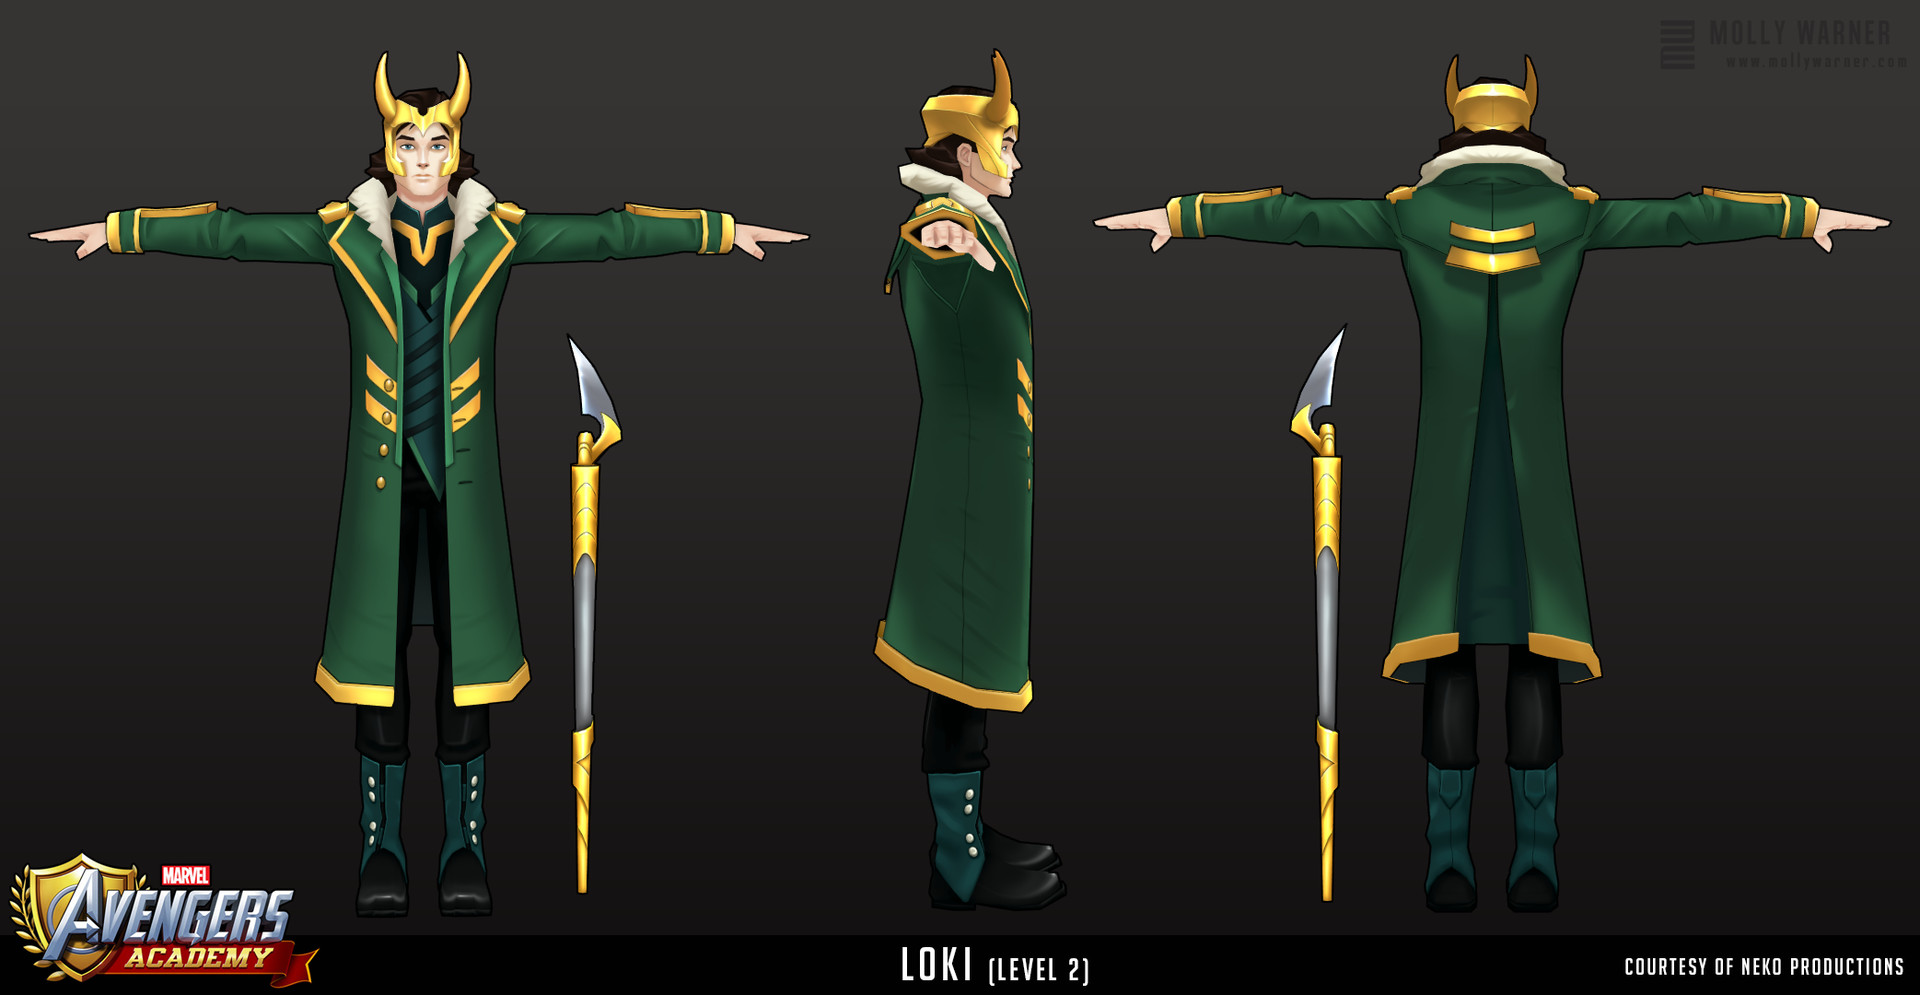 Molly warner 2 avengers academy loki l2